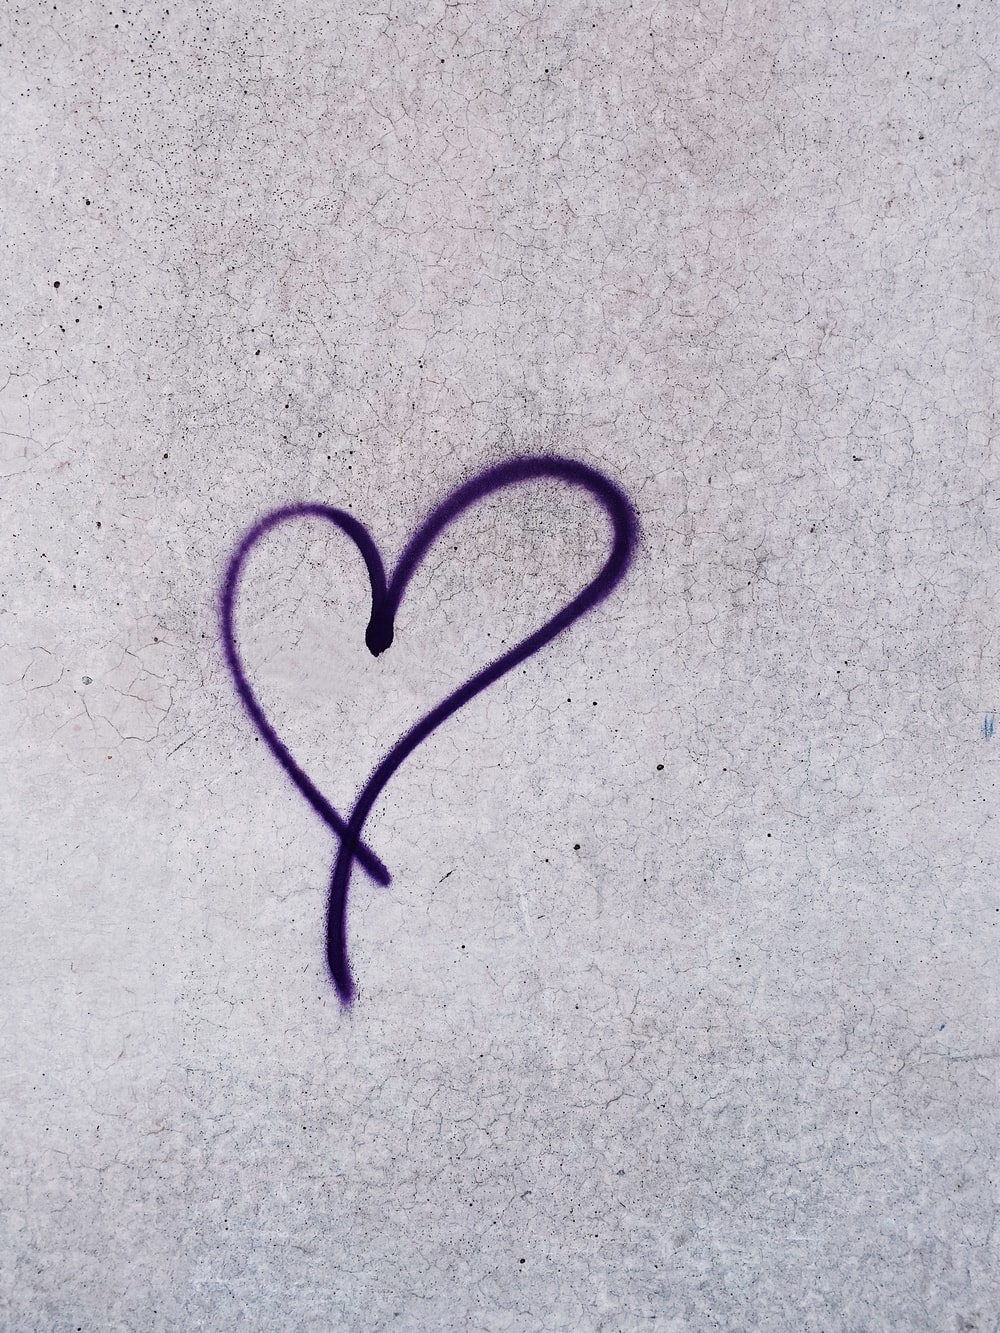 heart paint on gray wall